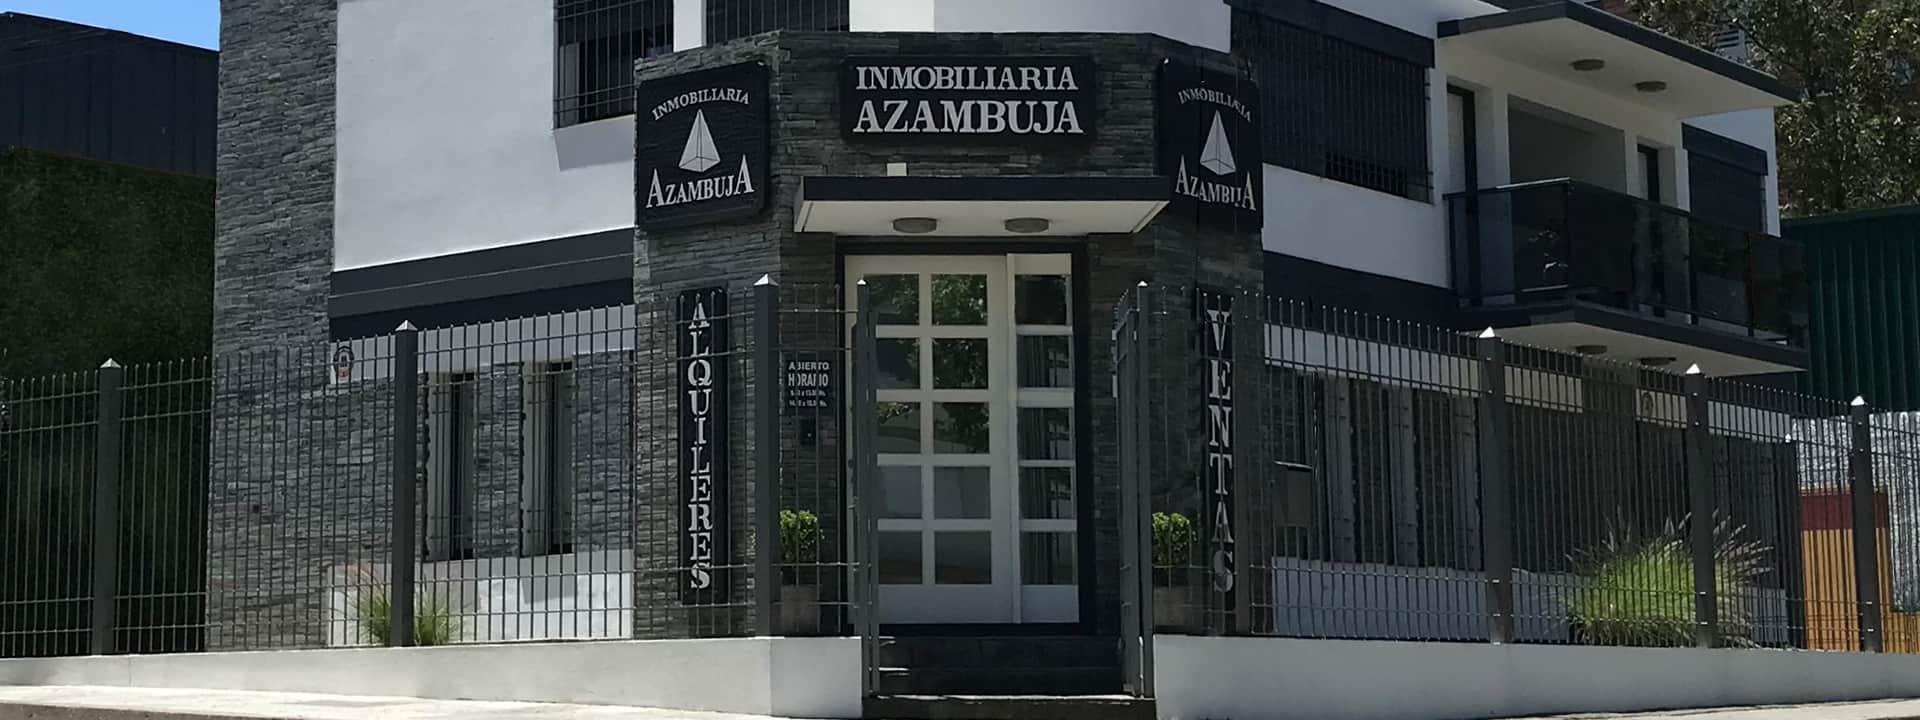 Azambuja inmobiliaria azambuja for Avenida muebles uruguay